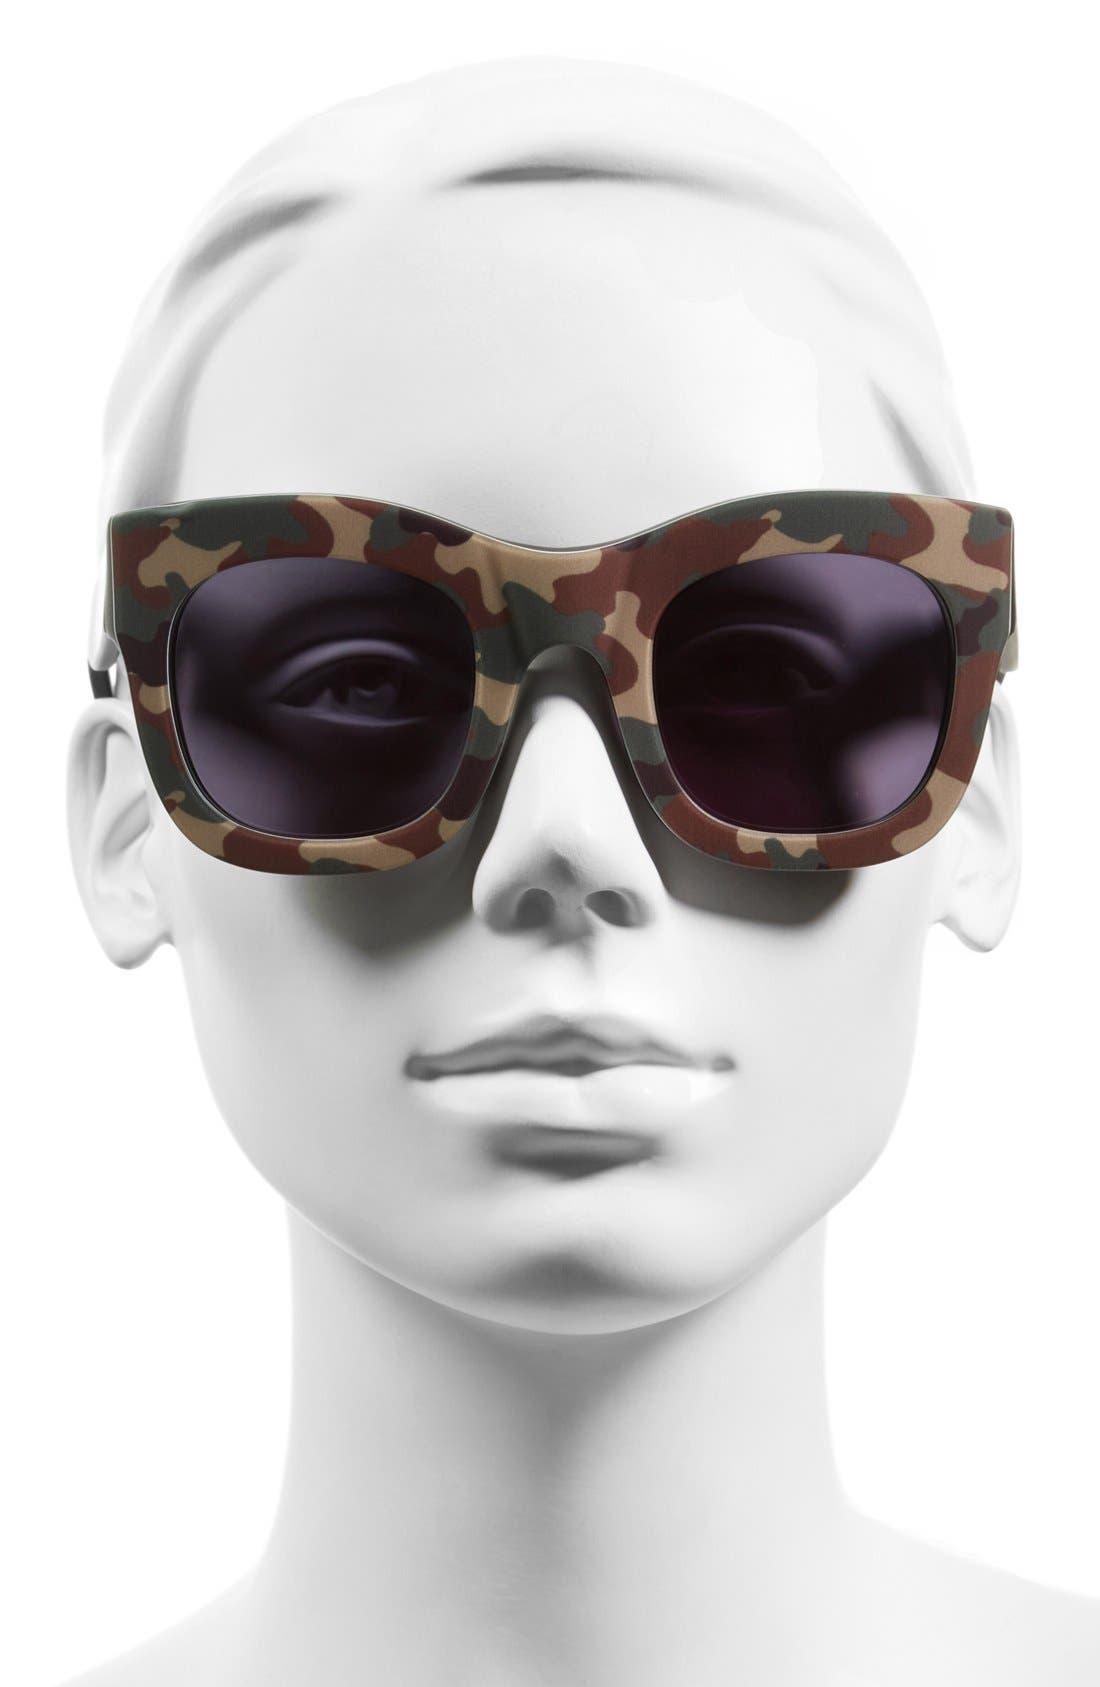 'Hamilton' 49mm Retro Sunglasses,                             Alternate thumbnail 19, color,